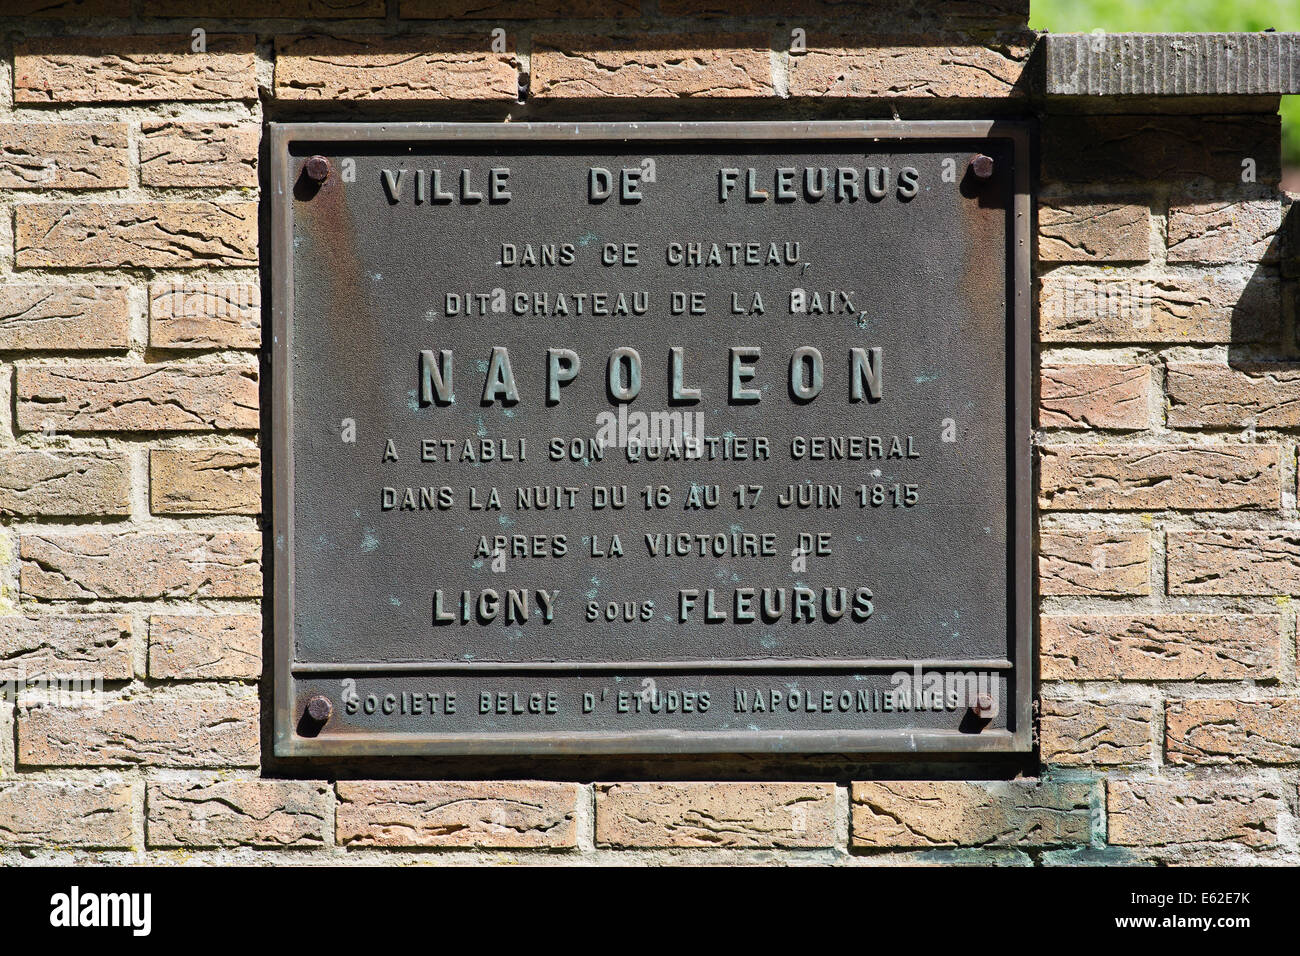 Brass commemorative plaque of Napoleon's overnight - Stock Image